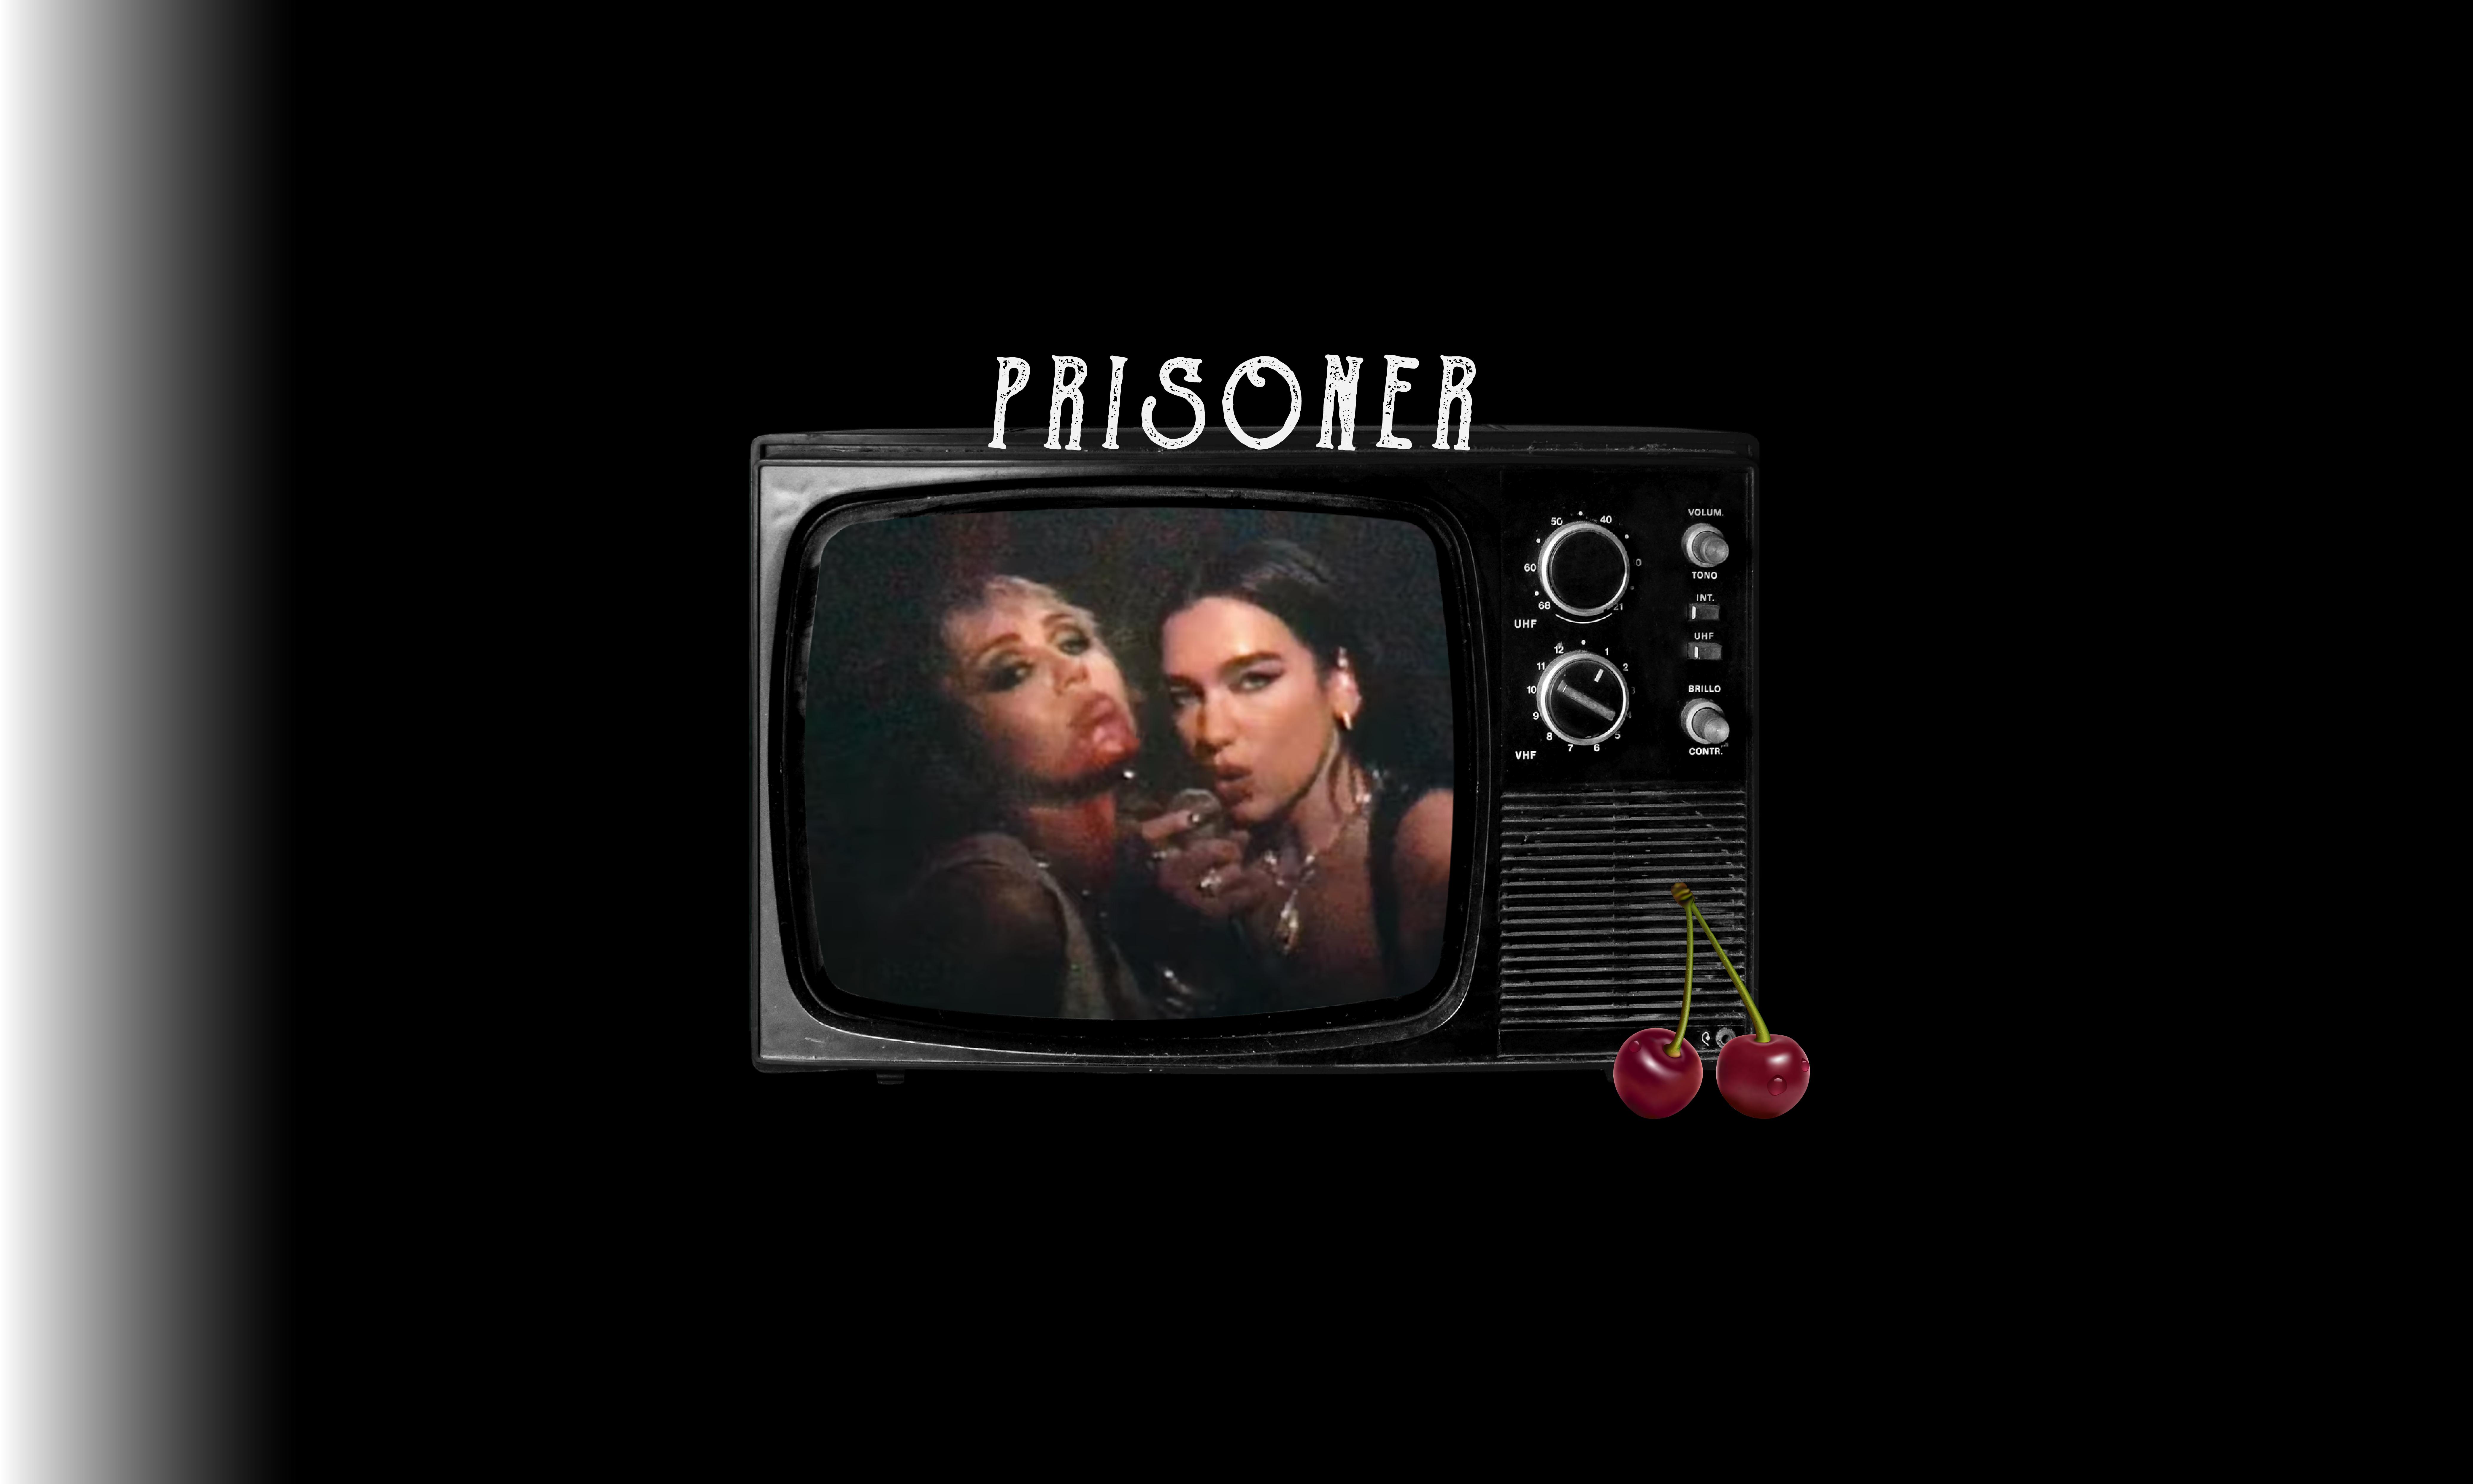 Miley Cyrus and Dua Lipa Prisoner - POPJUICE